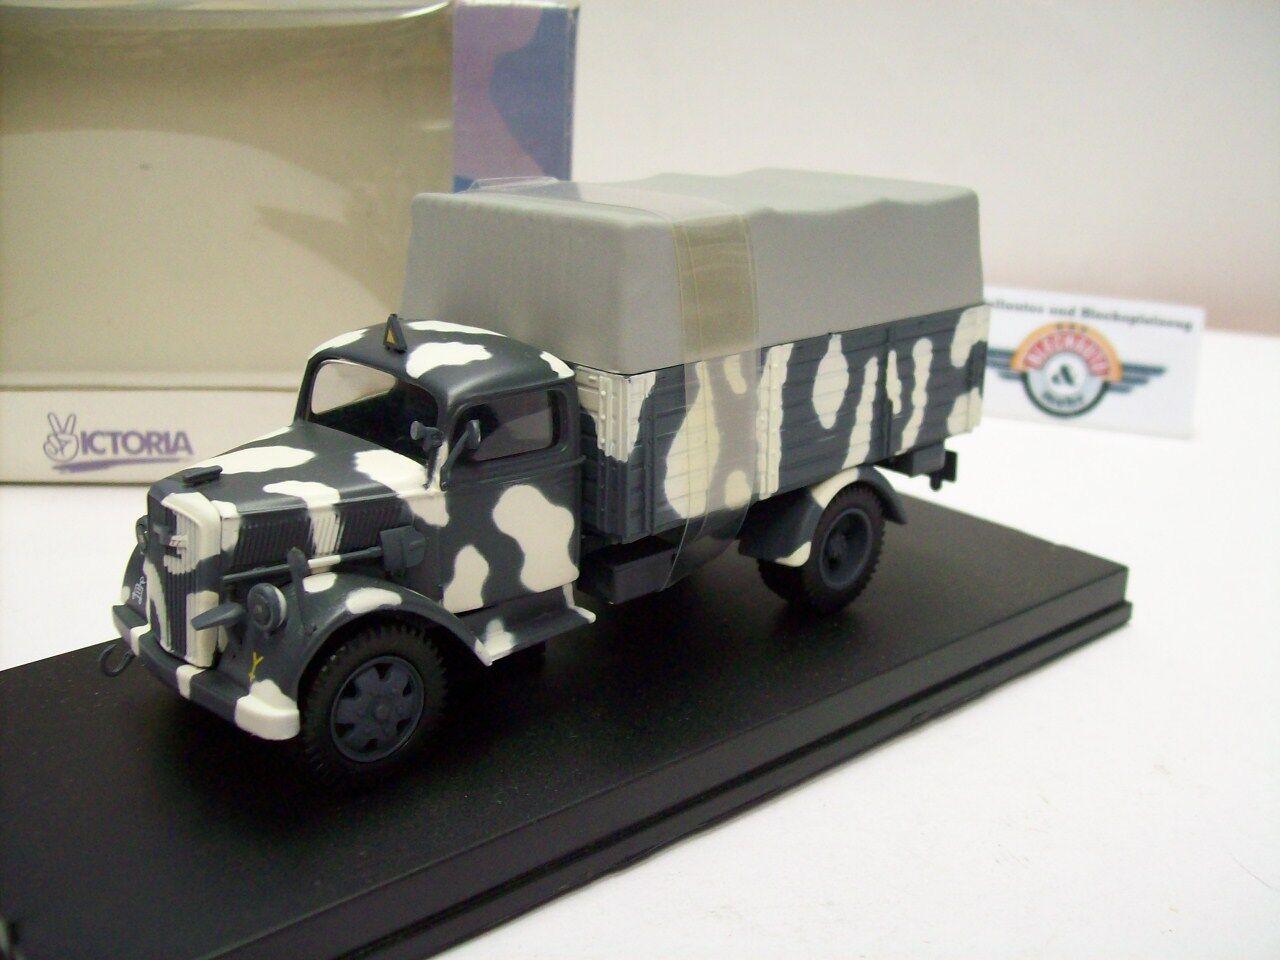 OPEL Blitz Troop Carrier, grigio/bianco, Whermacht Russia 1943, Vitesse 1:43, OVP